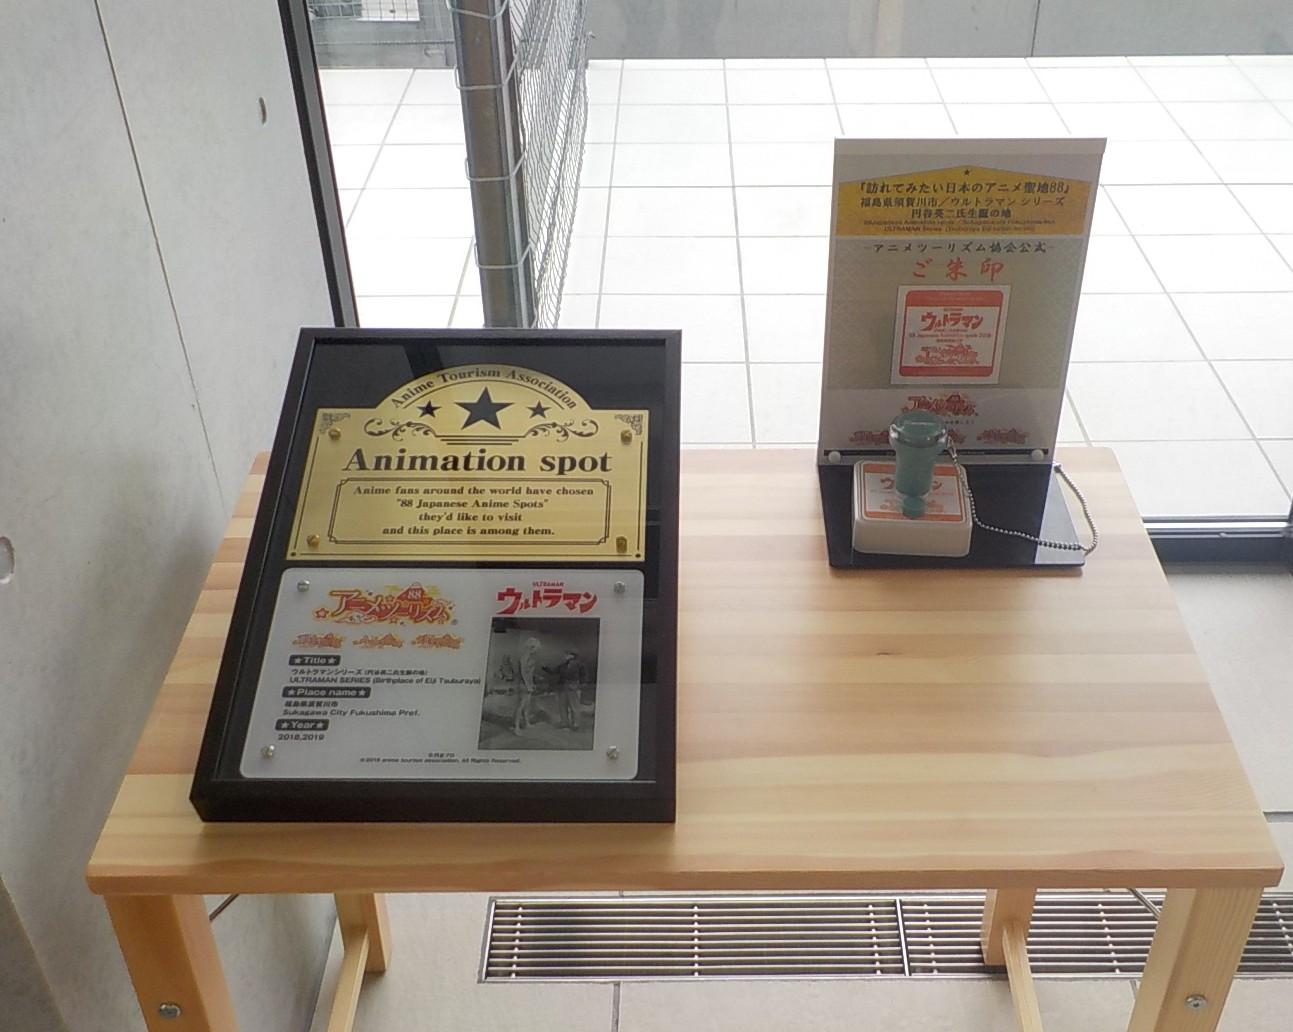 ULTRAMAN SERIES (Birthplace of Eiji Tsuburaya)